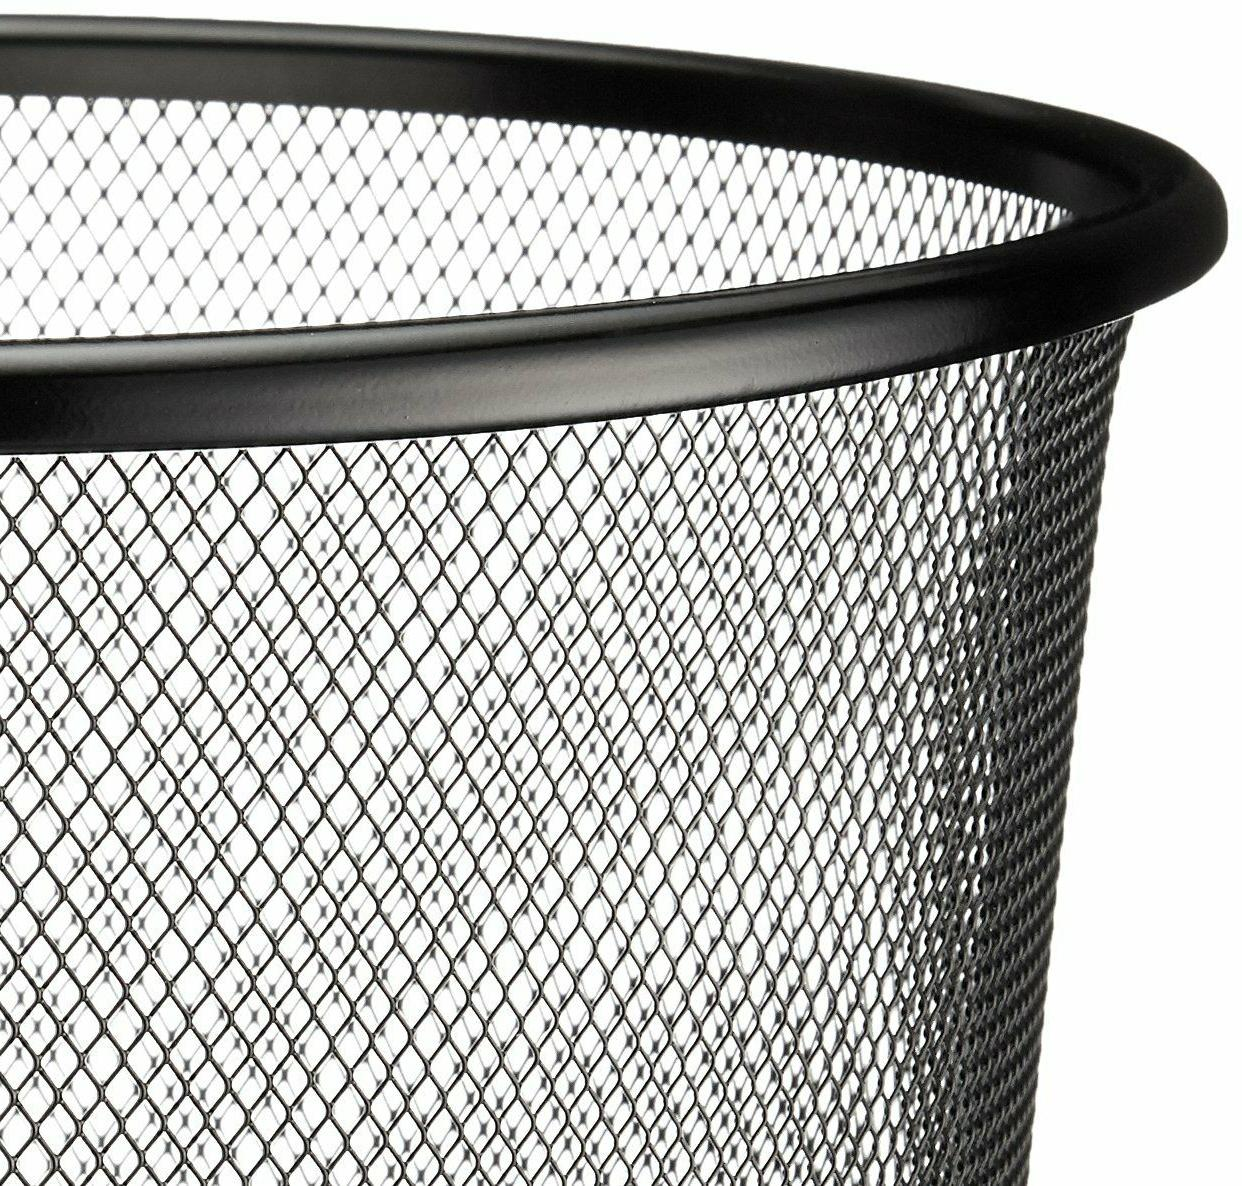 AmazonBasic Can Wastebasket Black 6-Pack DS-018_6